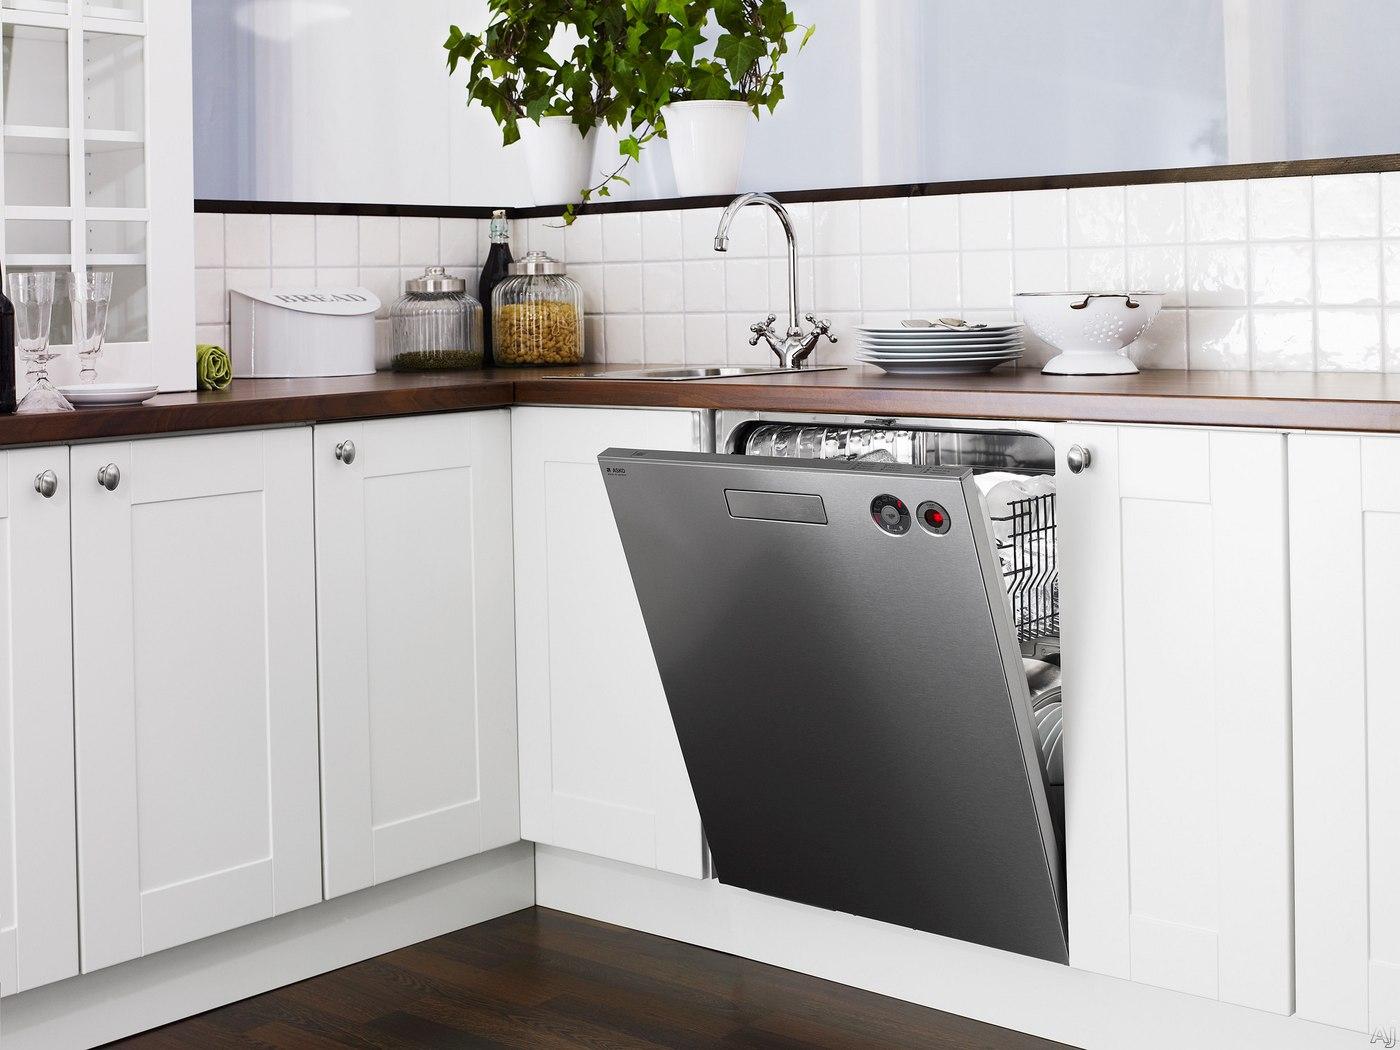 Asko Dishwasher Jpg